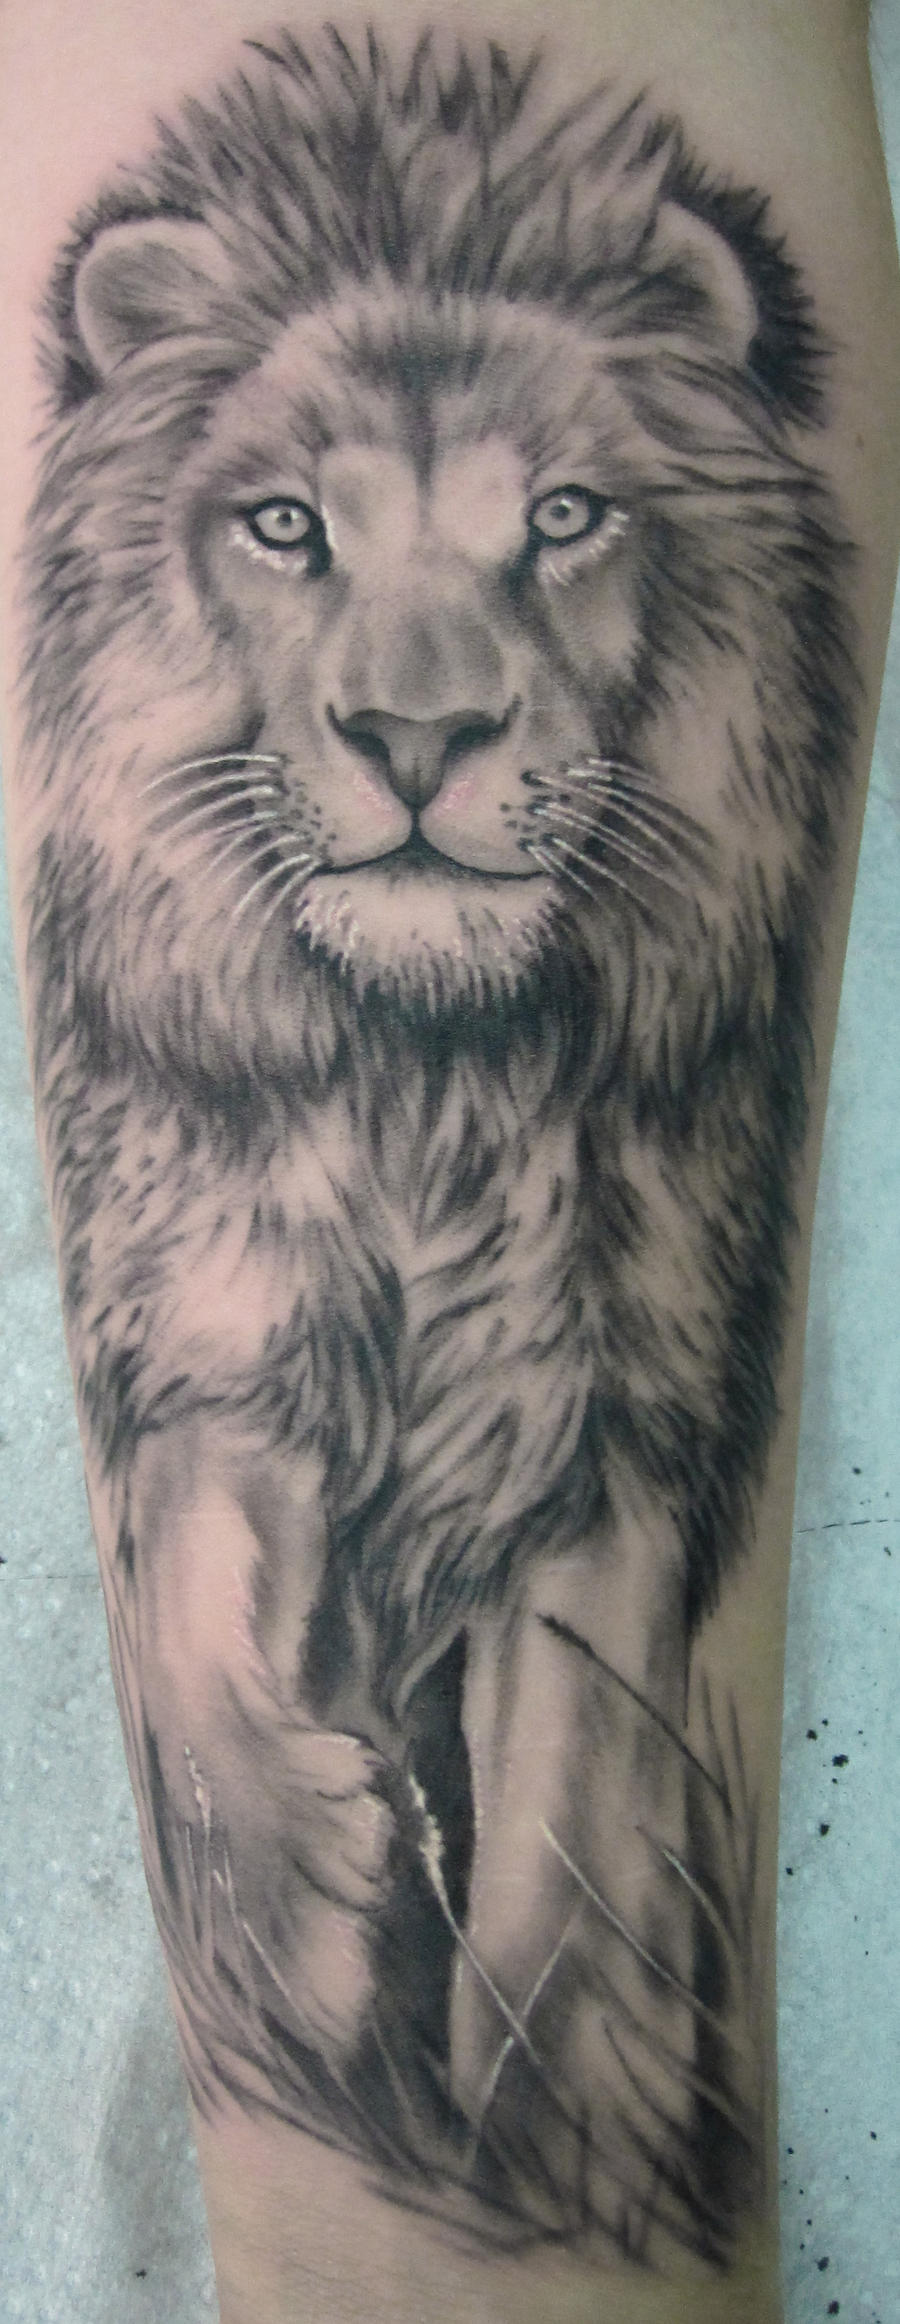 Tattoo Price